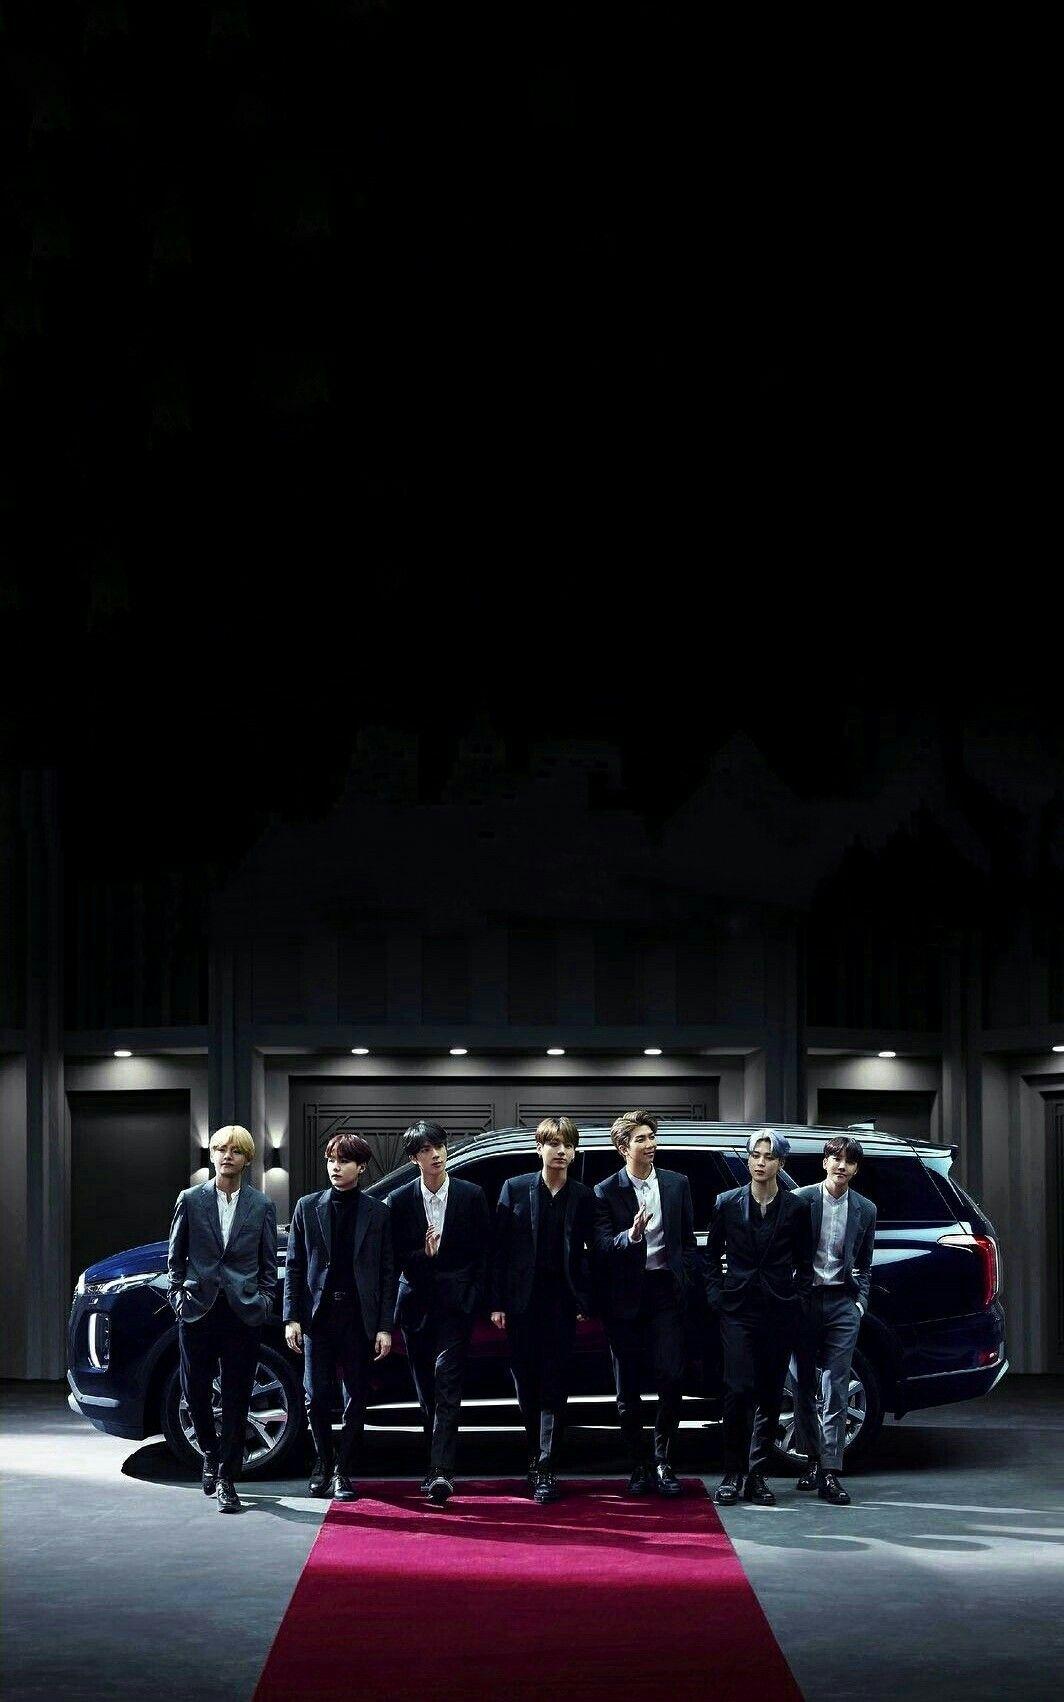 Bts X Hyundai Bts Gambar Wajah Seokjin Kim Namjoon